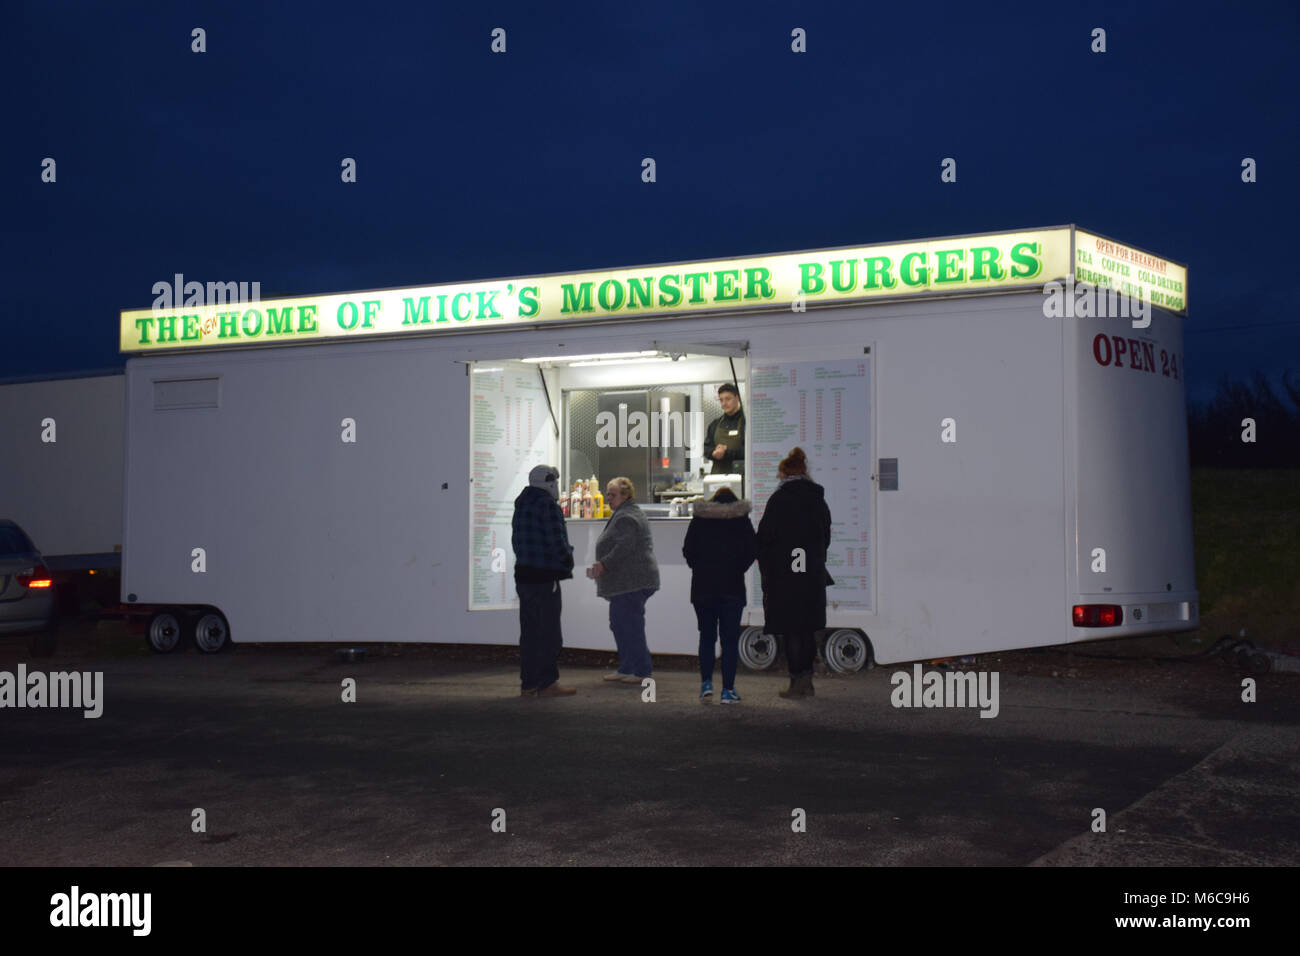 Mobile burger bar at night, Portsmouth UK - Stock Image